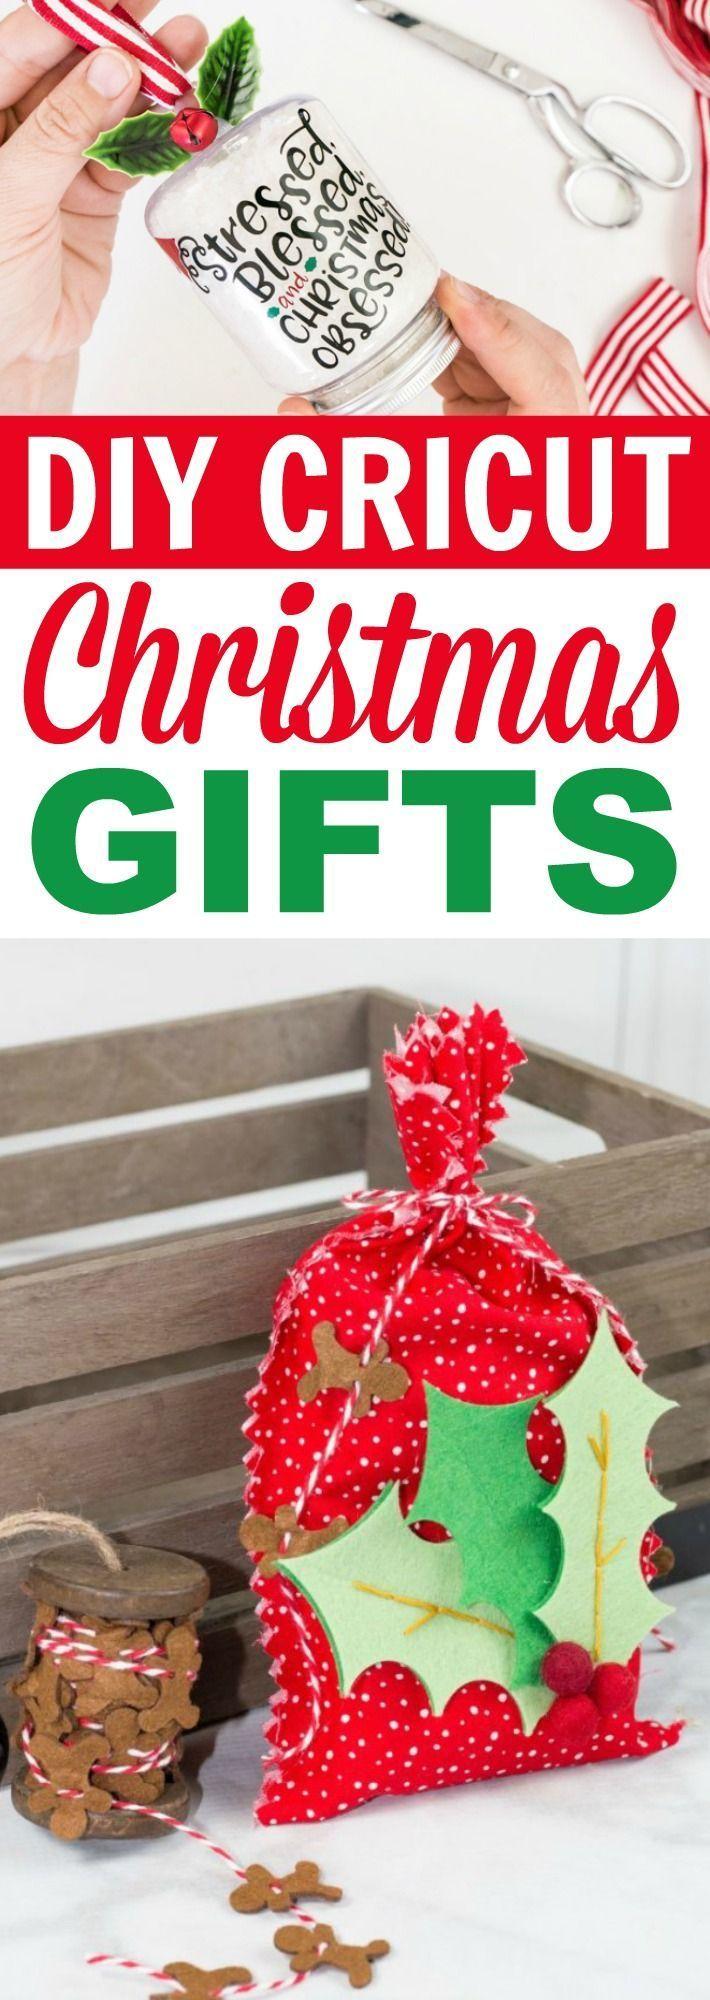 DIY Cricut Christmas Gifts | Weihnachten: Persönliche ...